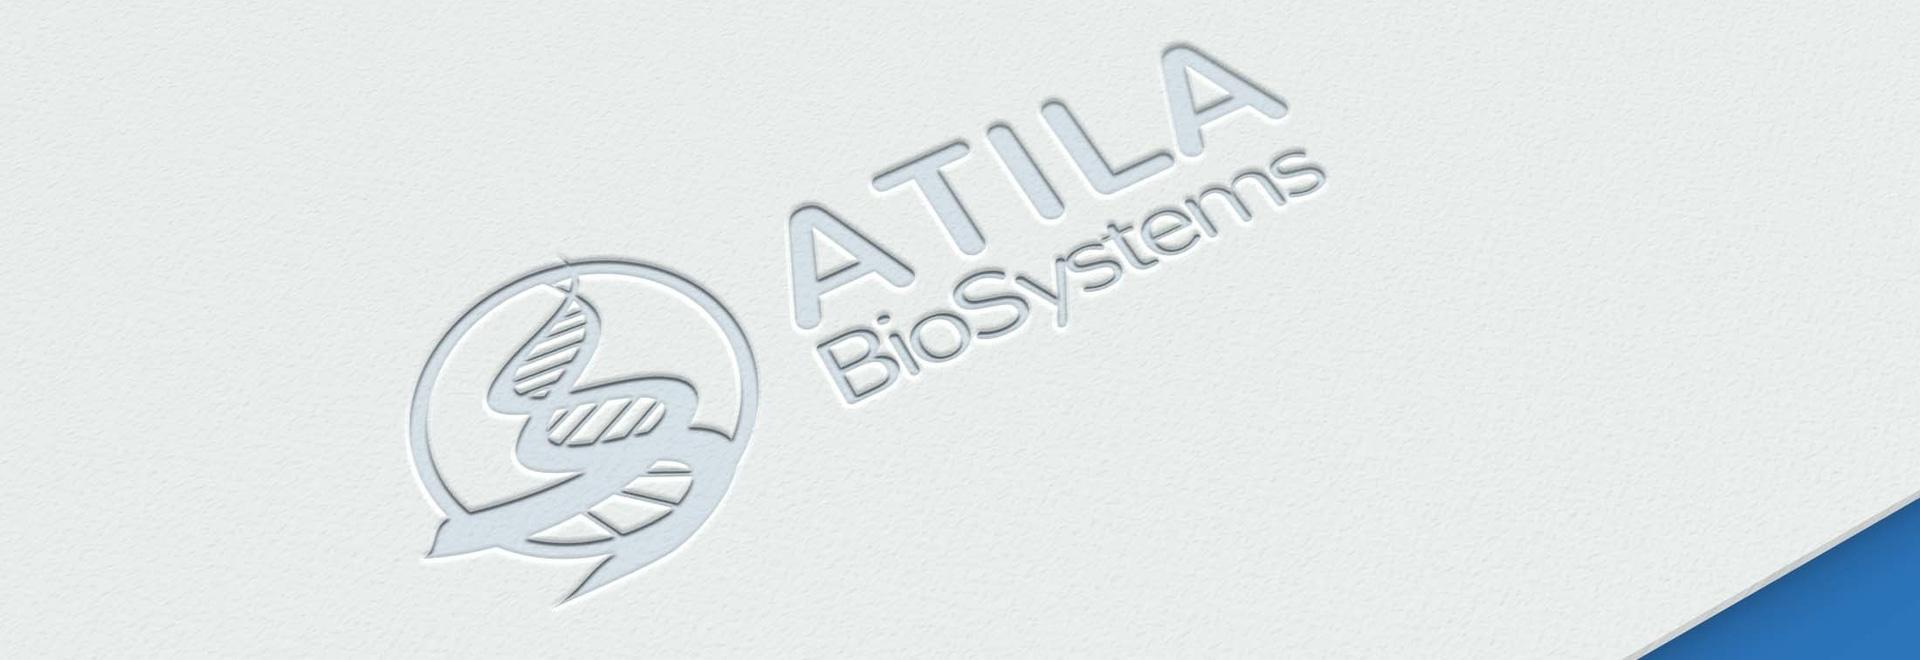 Atila BioSystems